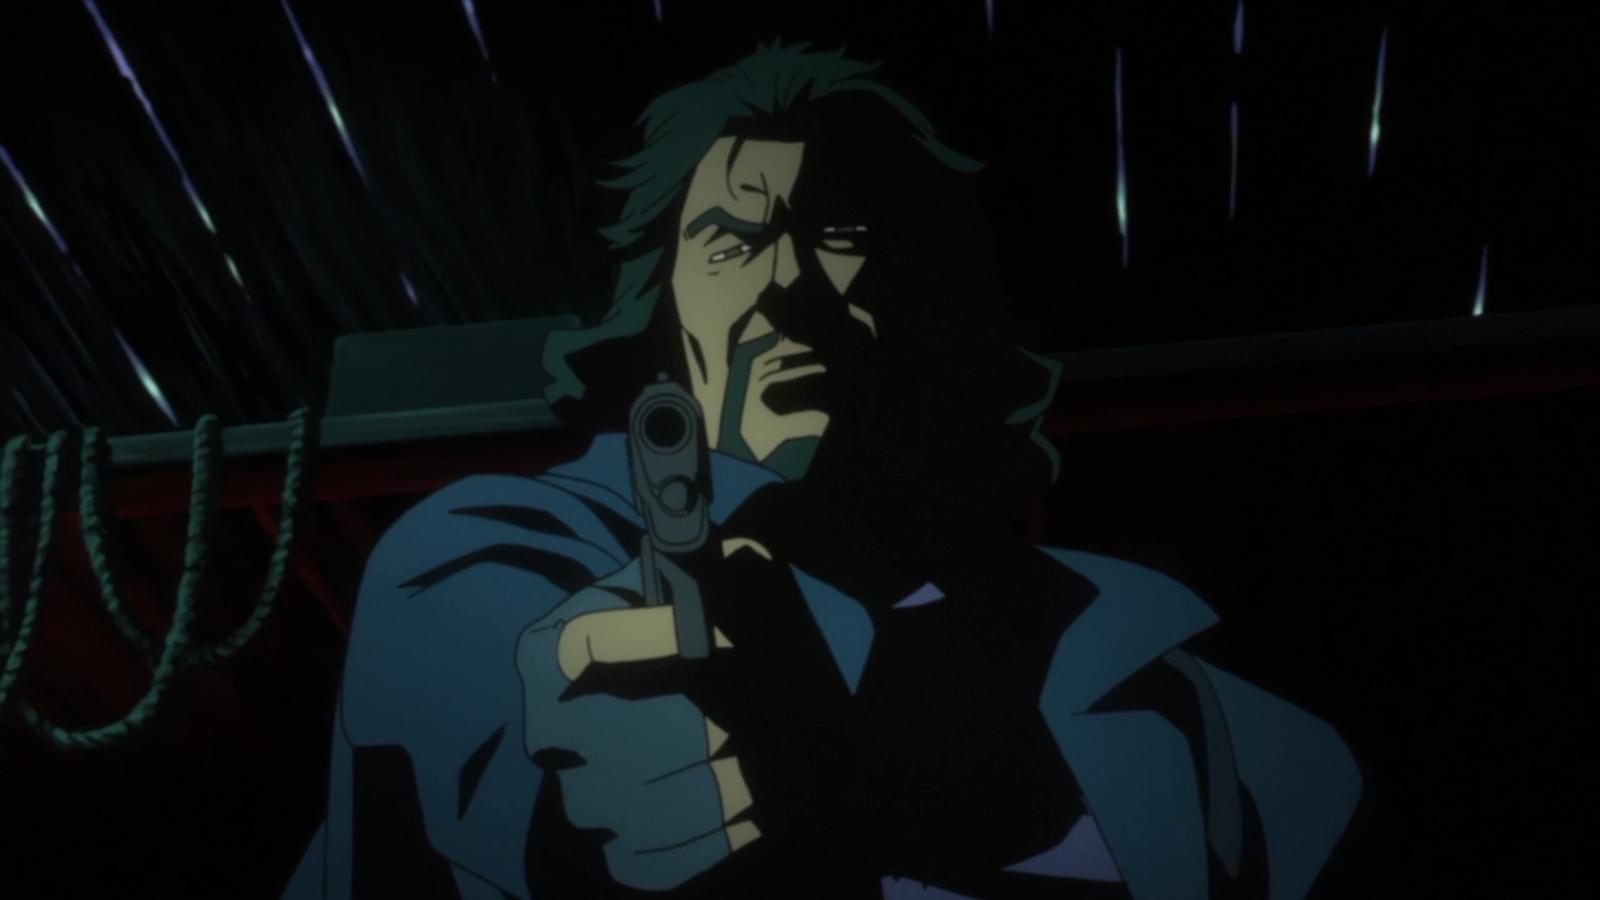 Jason (Anime Series)